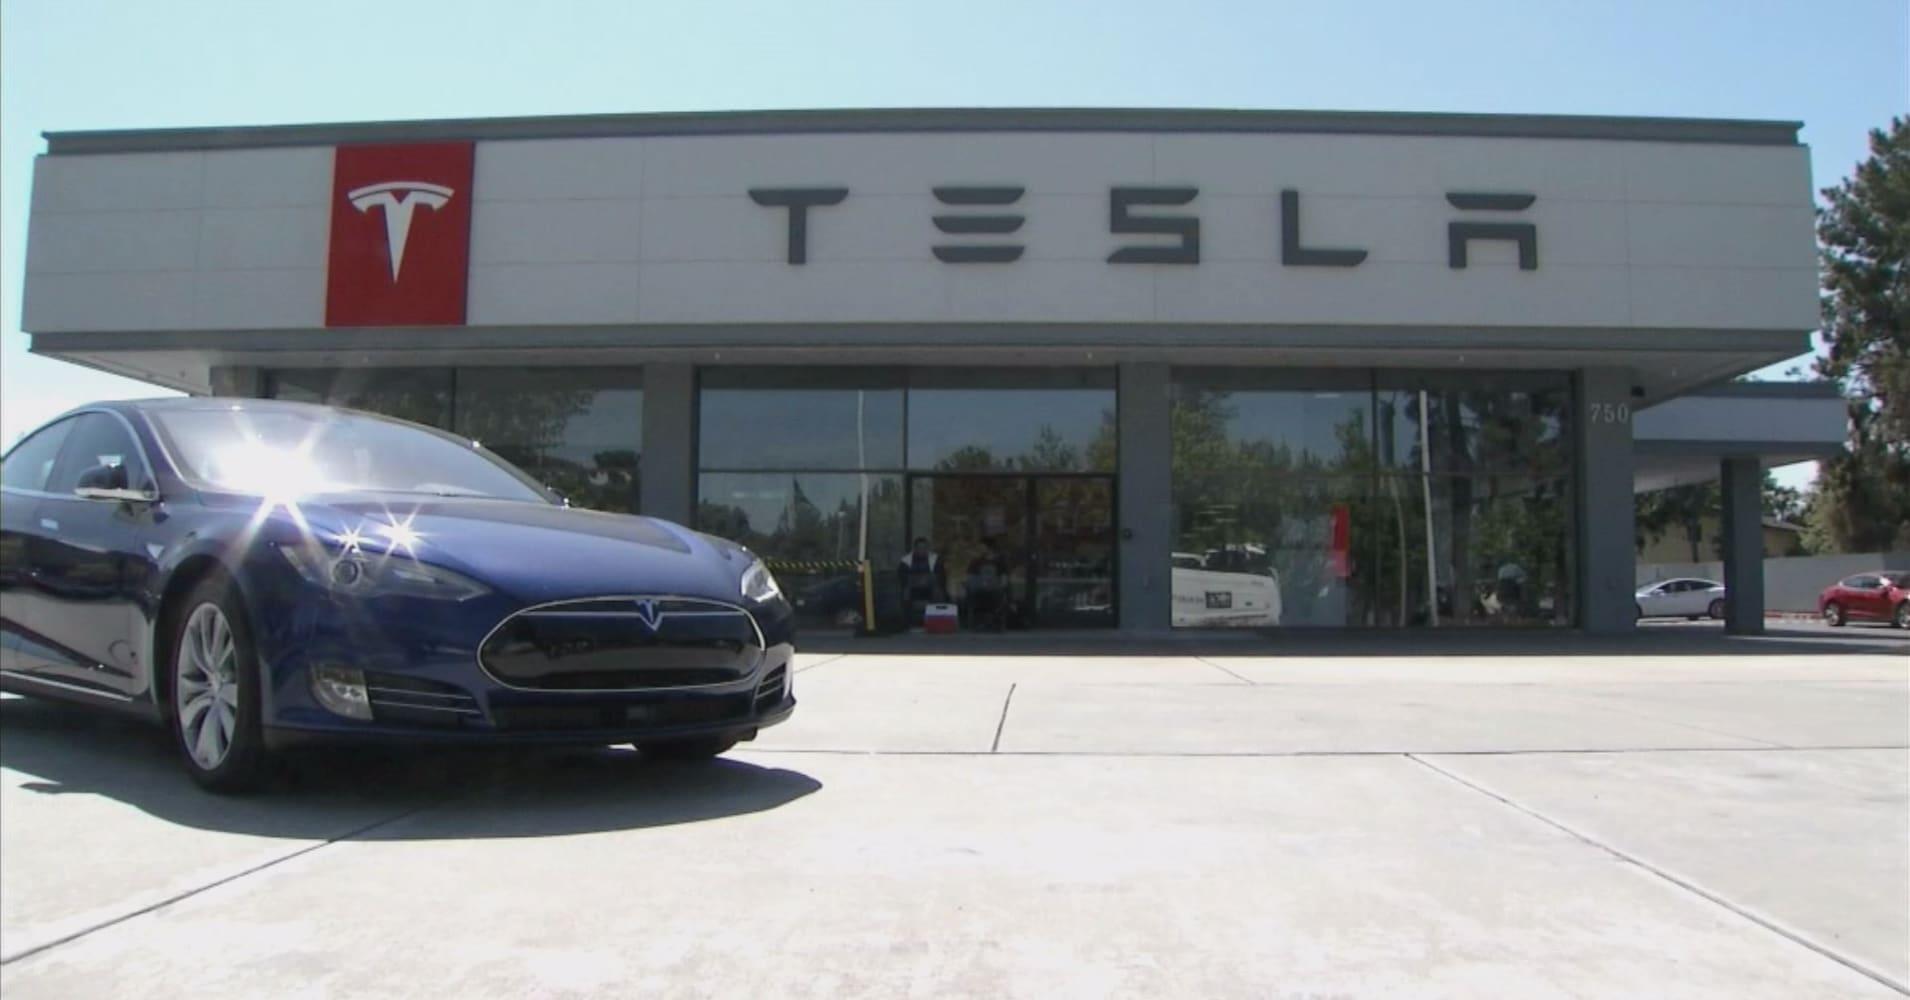 Silicon Valley Tesla Tesla Image